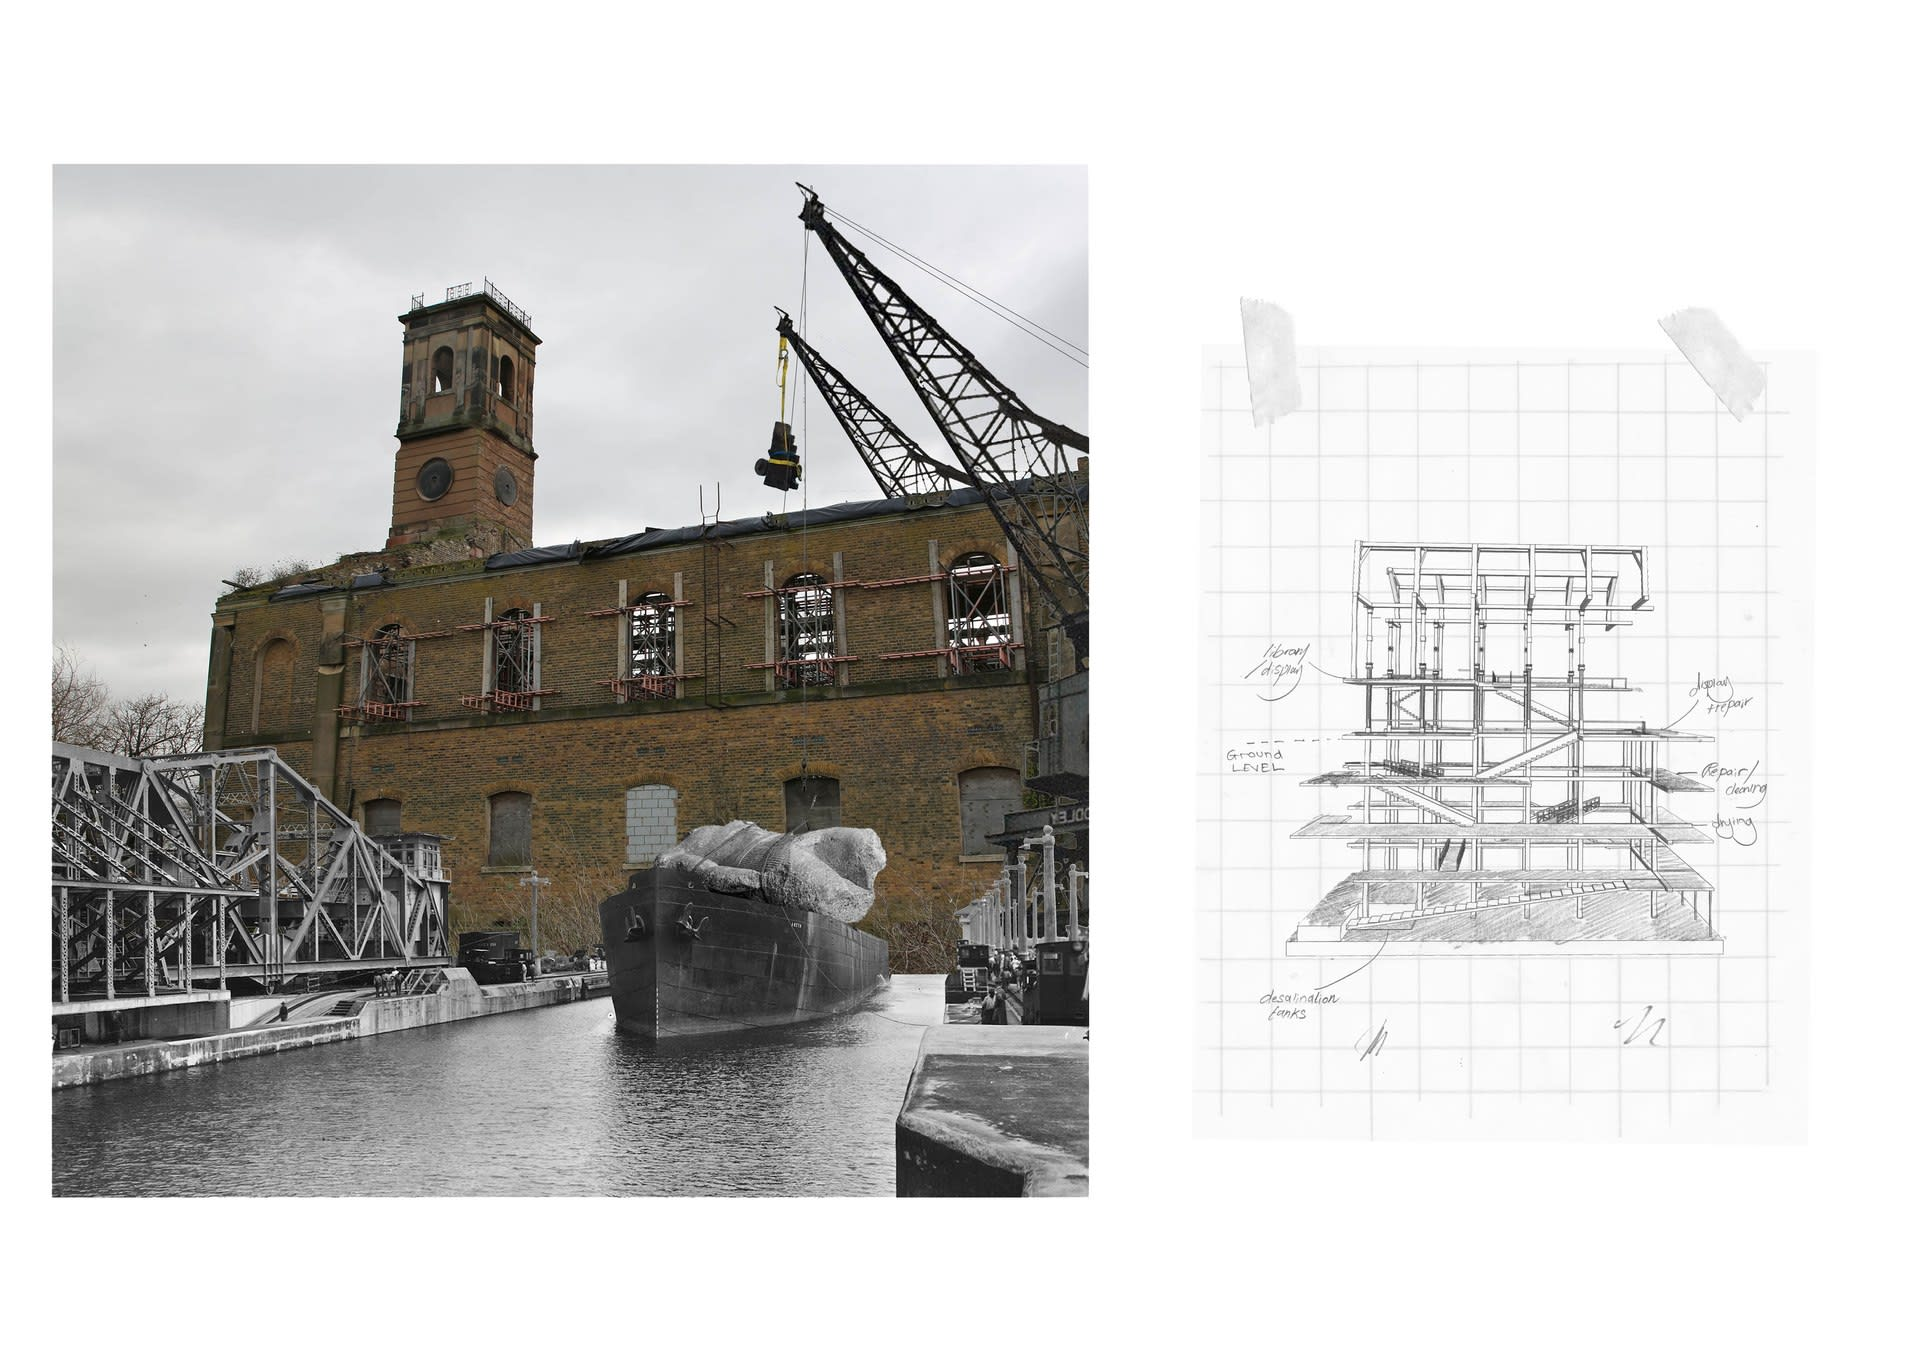 Designing the Thames Ship Lab (Sketchbook Excerpts)